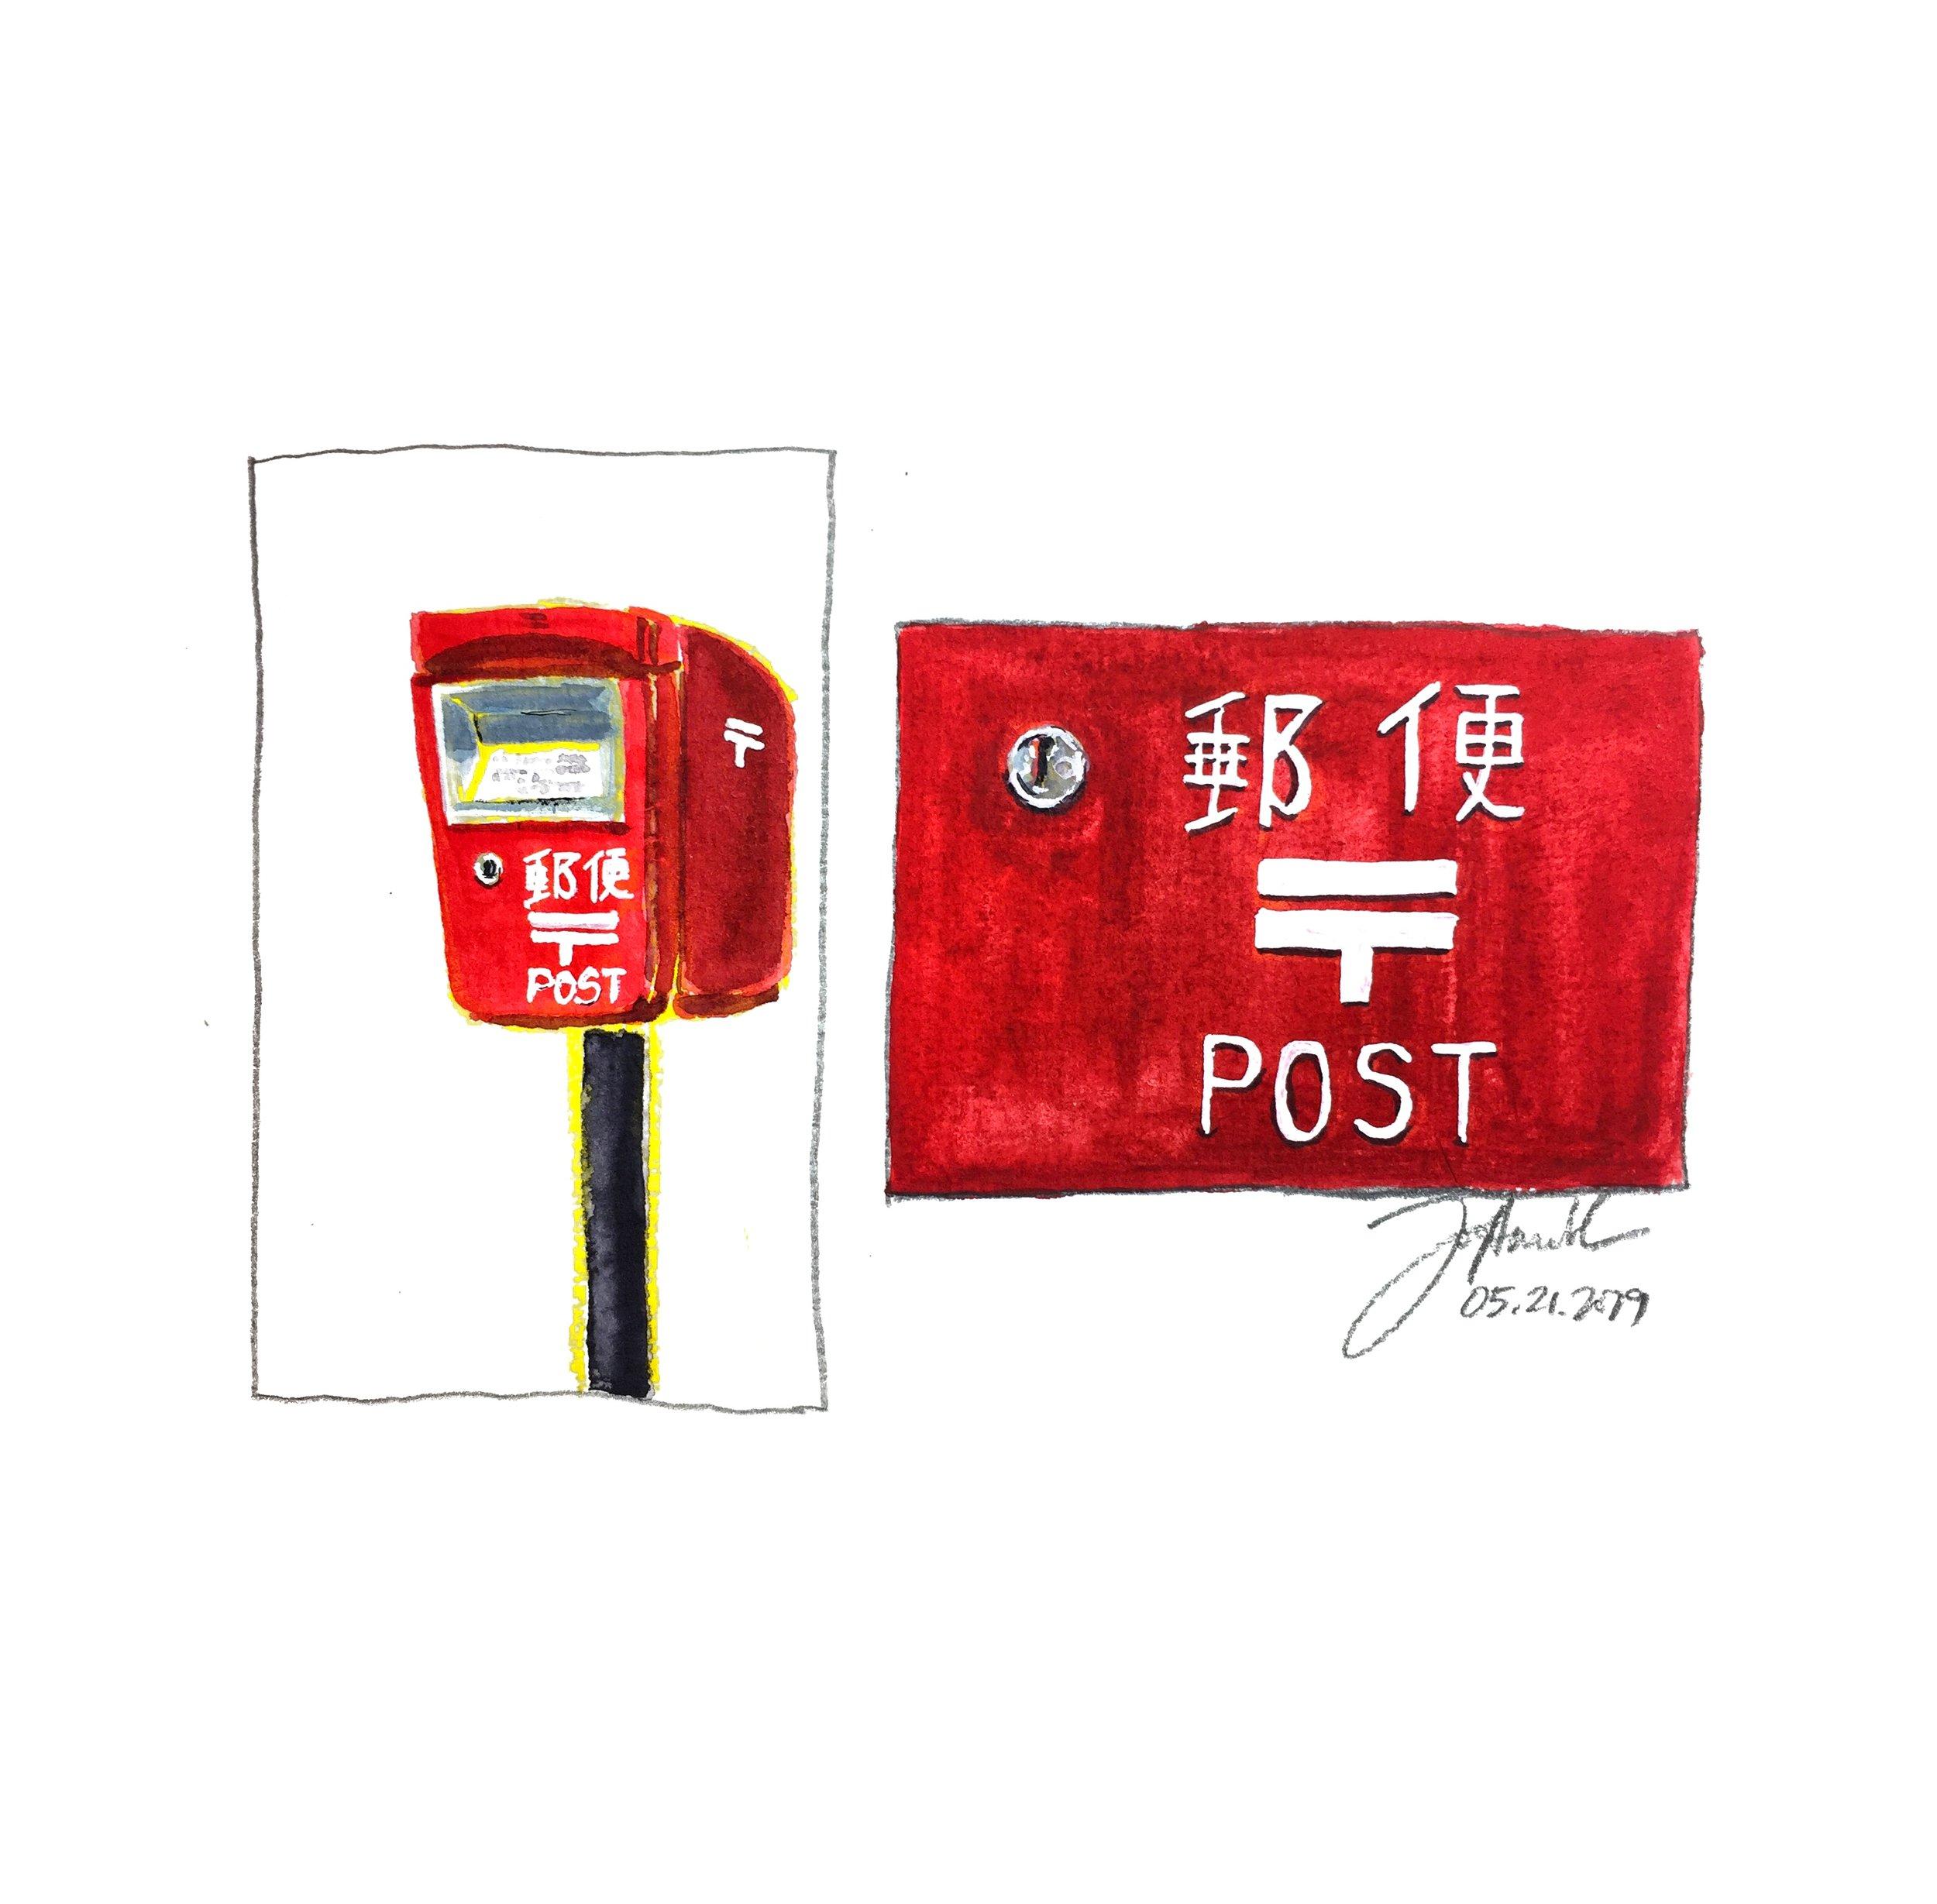 the neighborhood mailbox